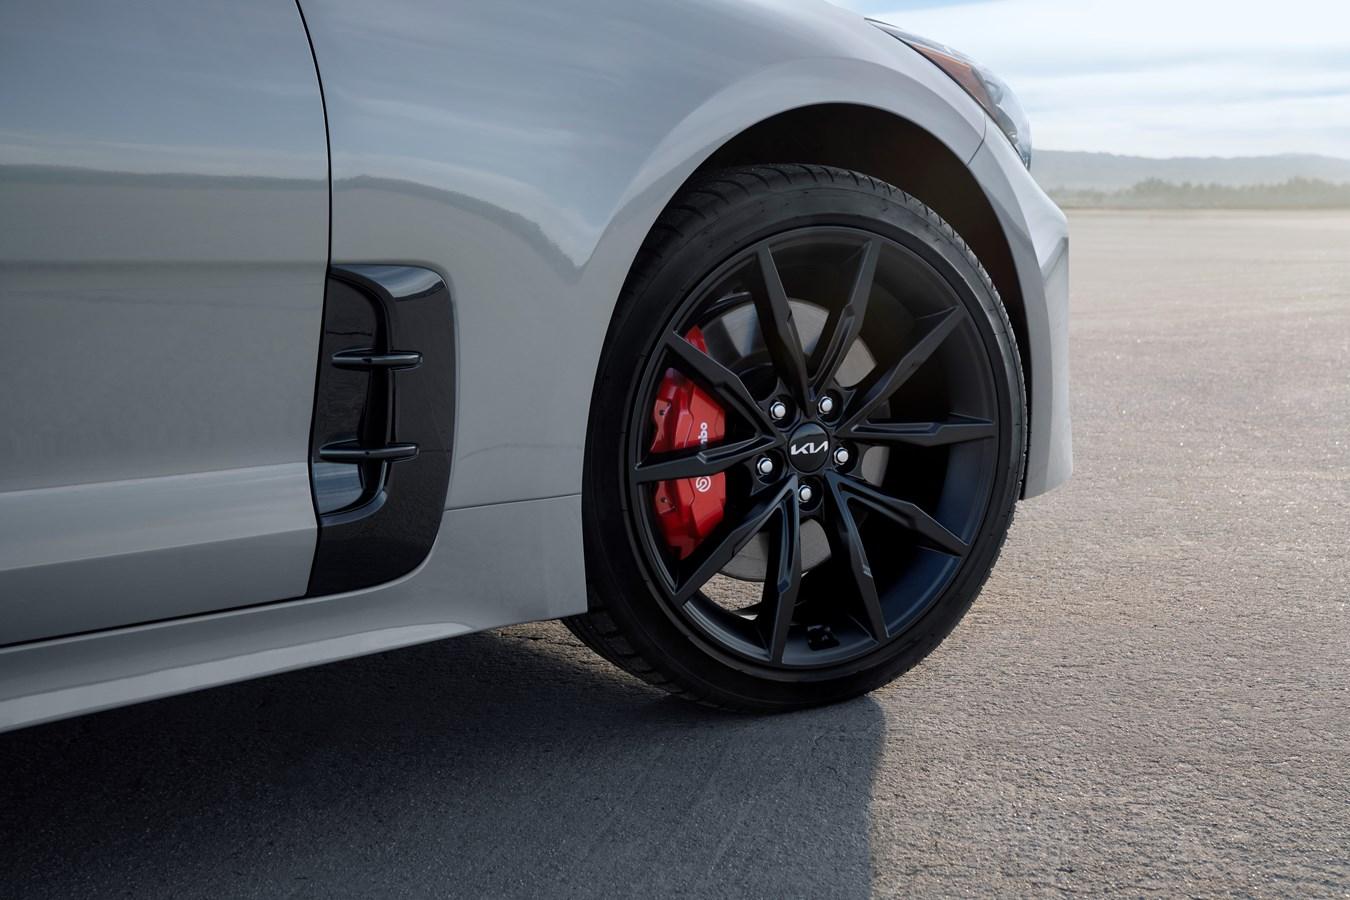 2022 Stinger Scorpion Special Edition wheel tire brake detail